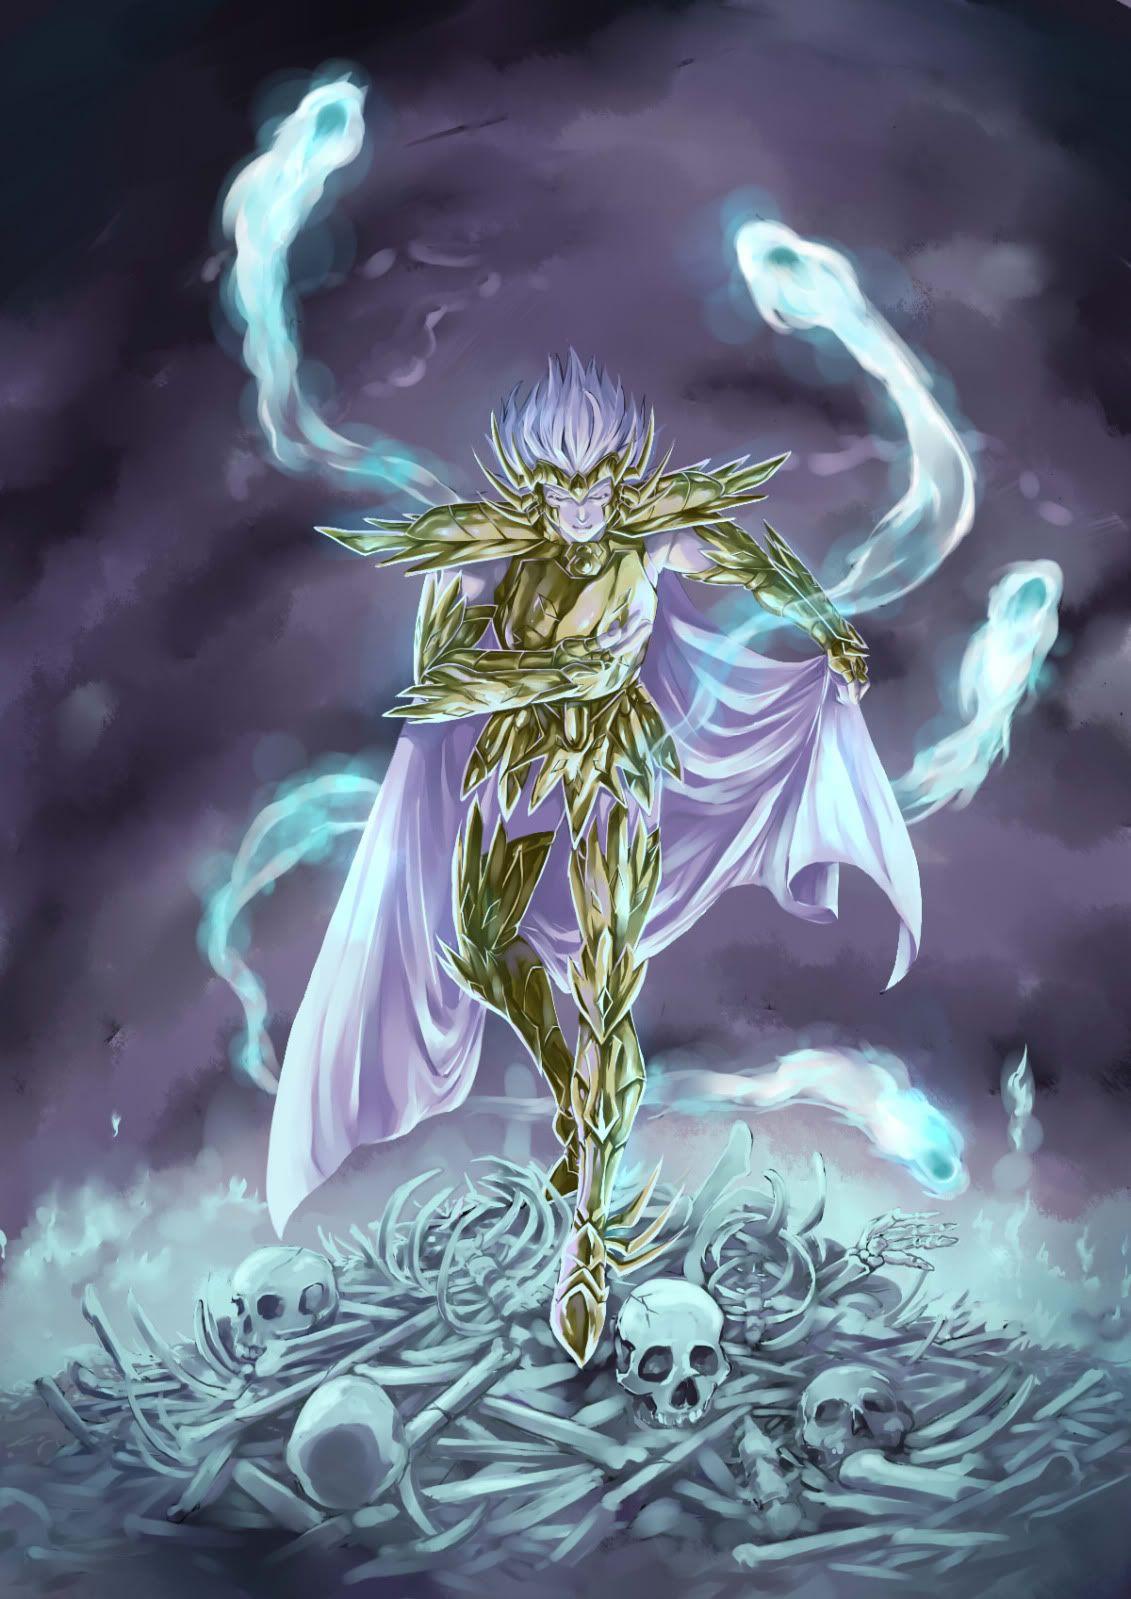 Seu Deus Está Morto! - As Desventuras entre o Cavaleiro da Morte e o Juiz do Inferno A574870082601d7050d74d72f0c48a69